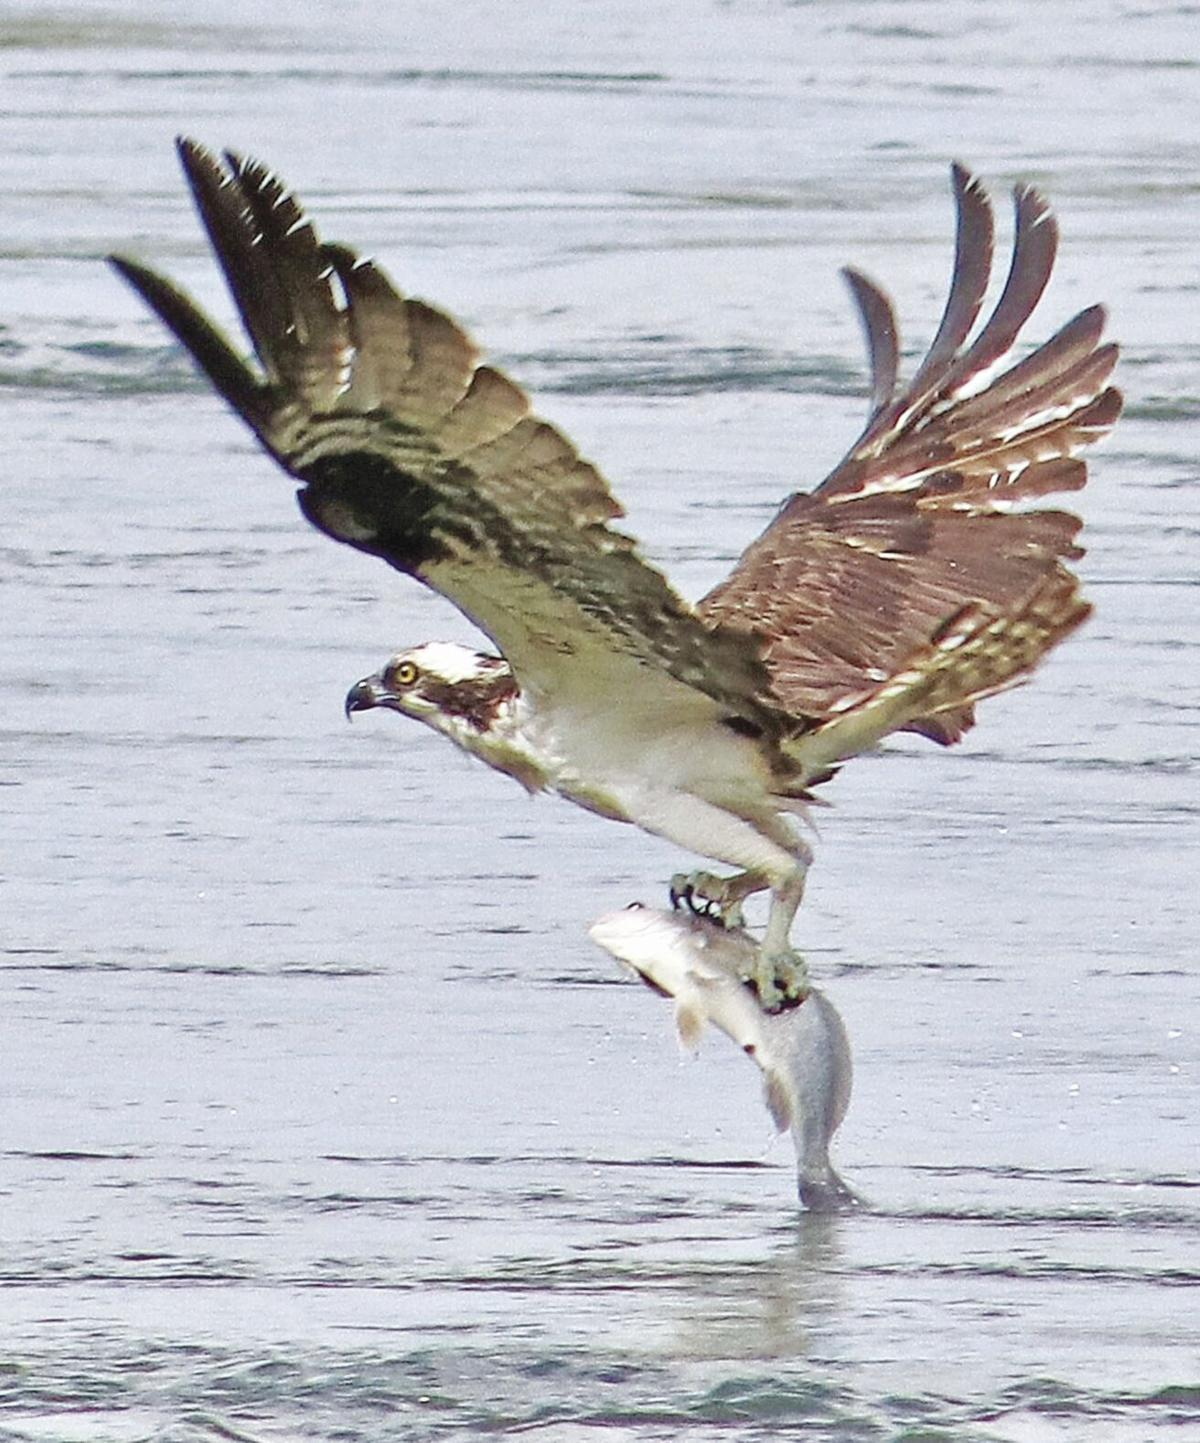 Osprey plucks fish